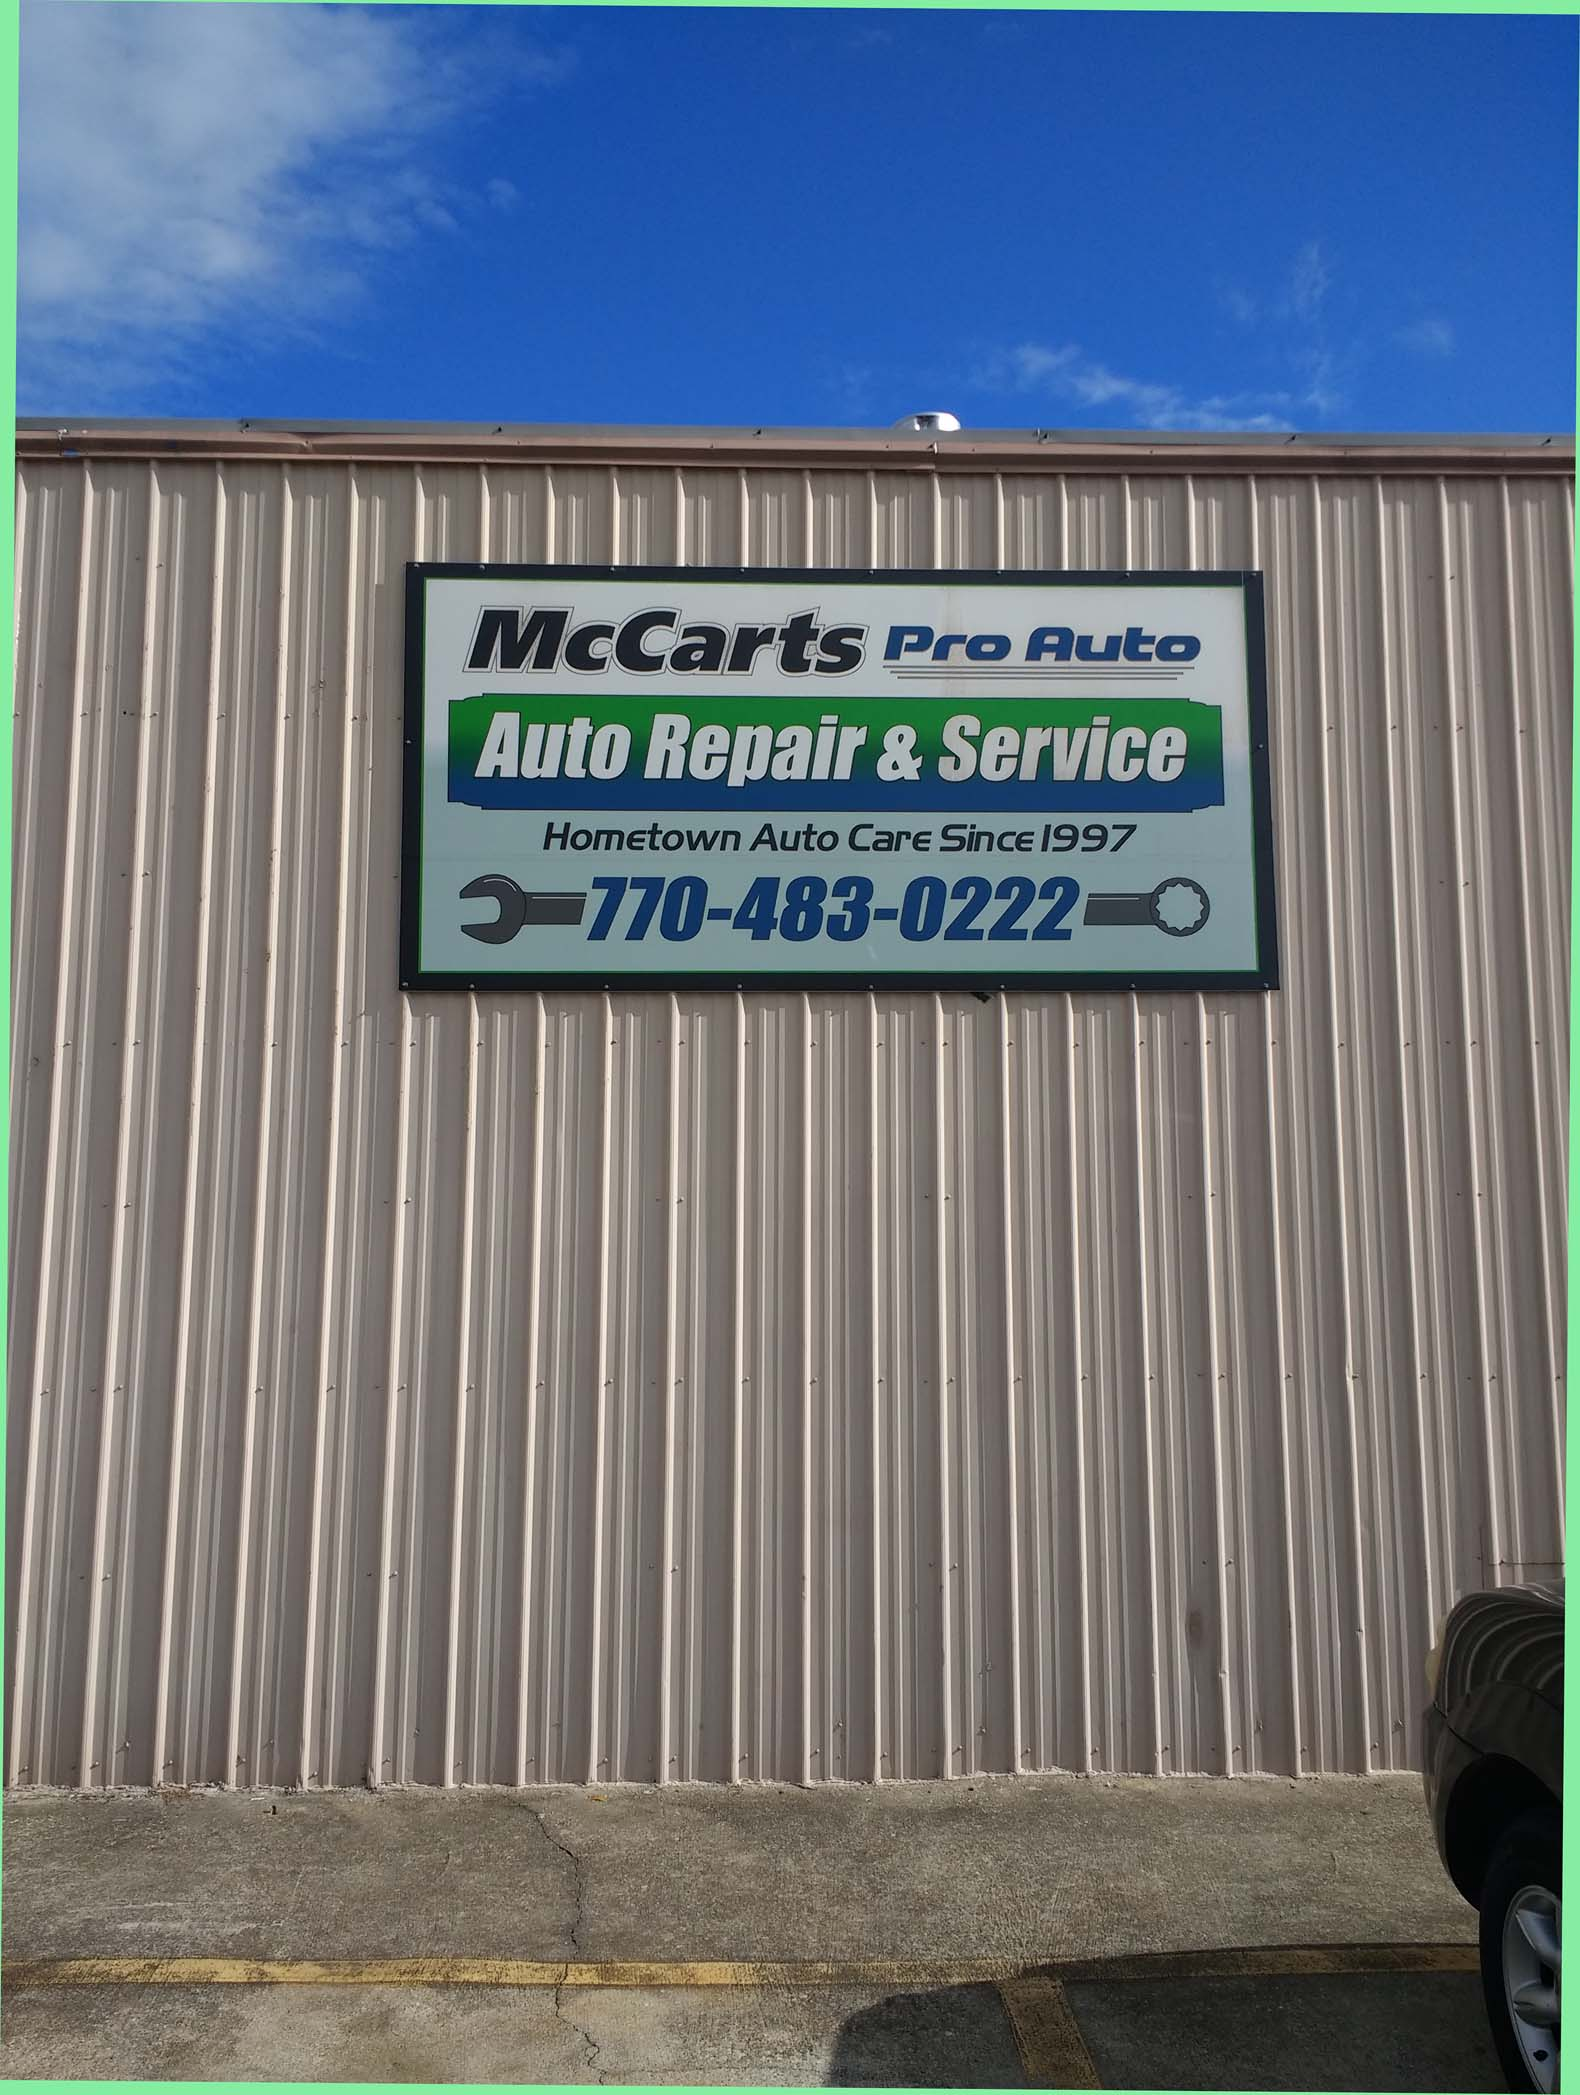 McCART'S PRO-AUTO INC.